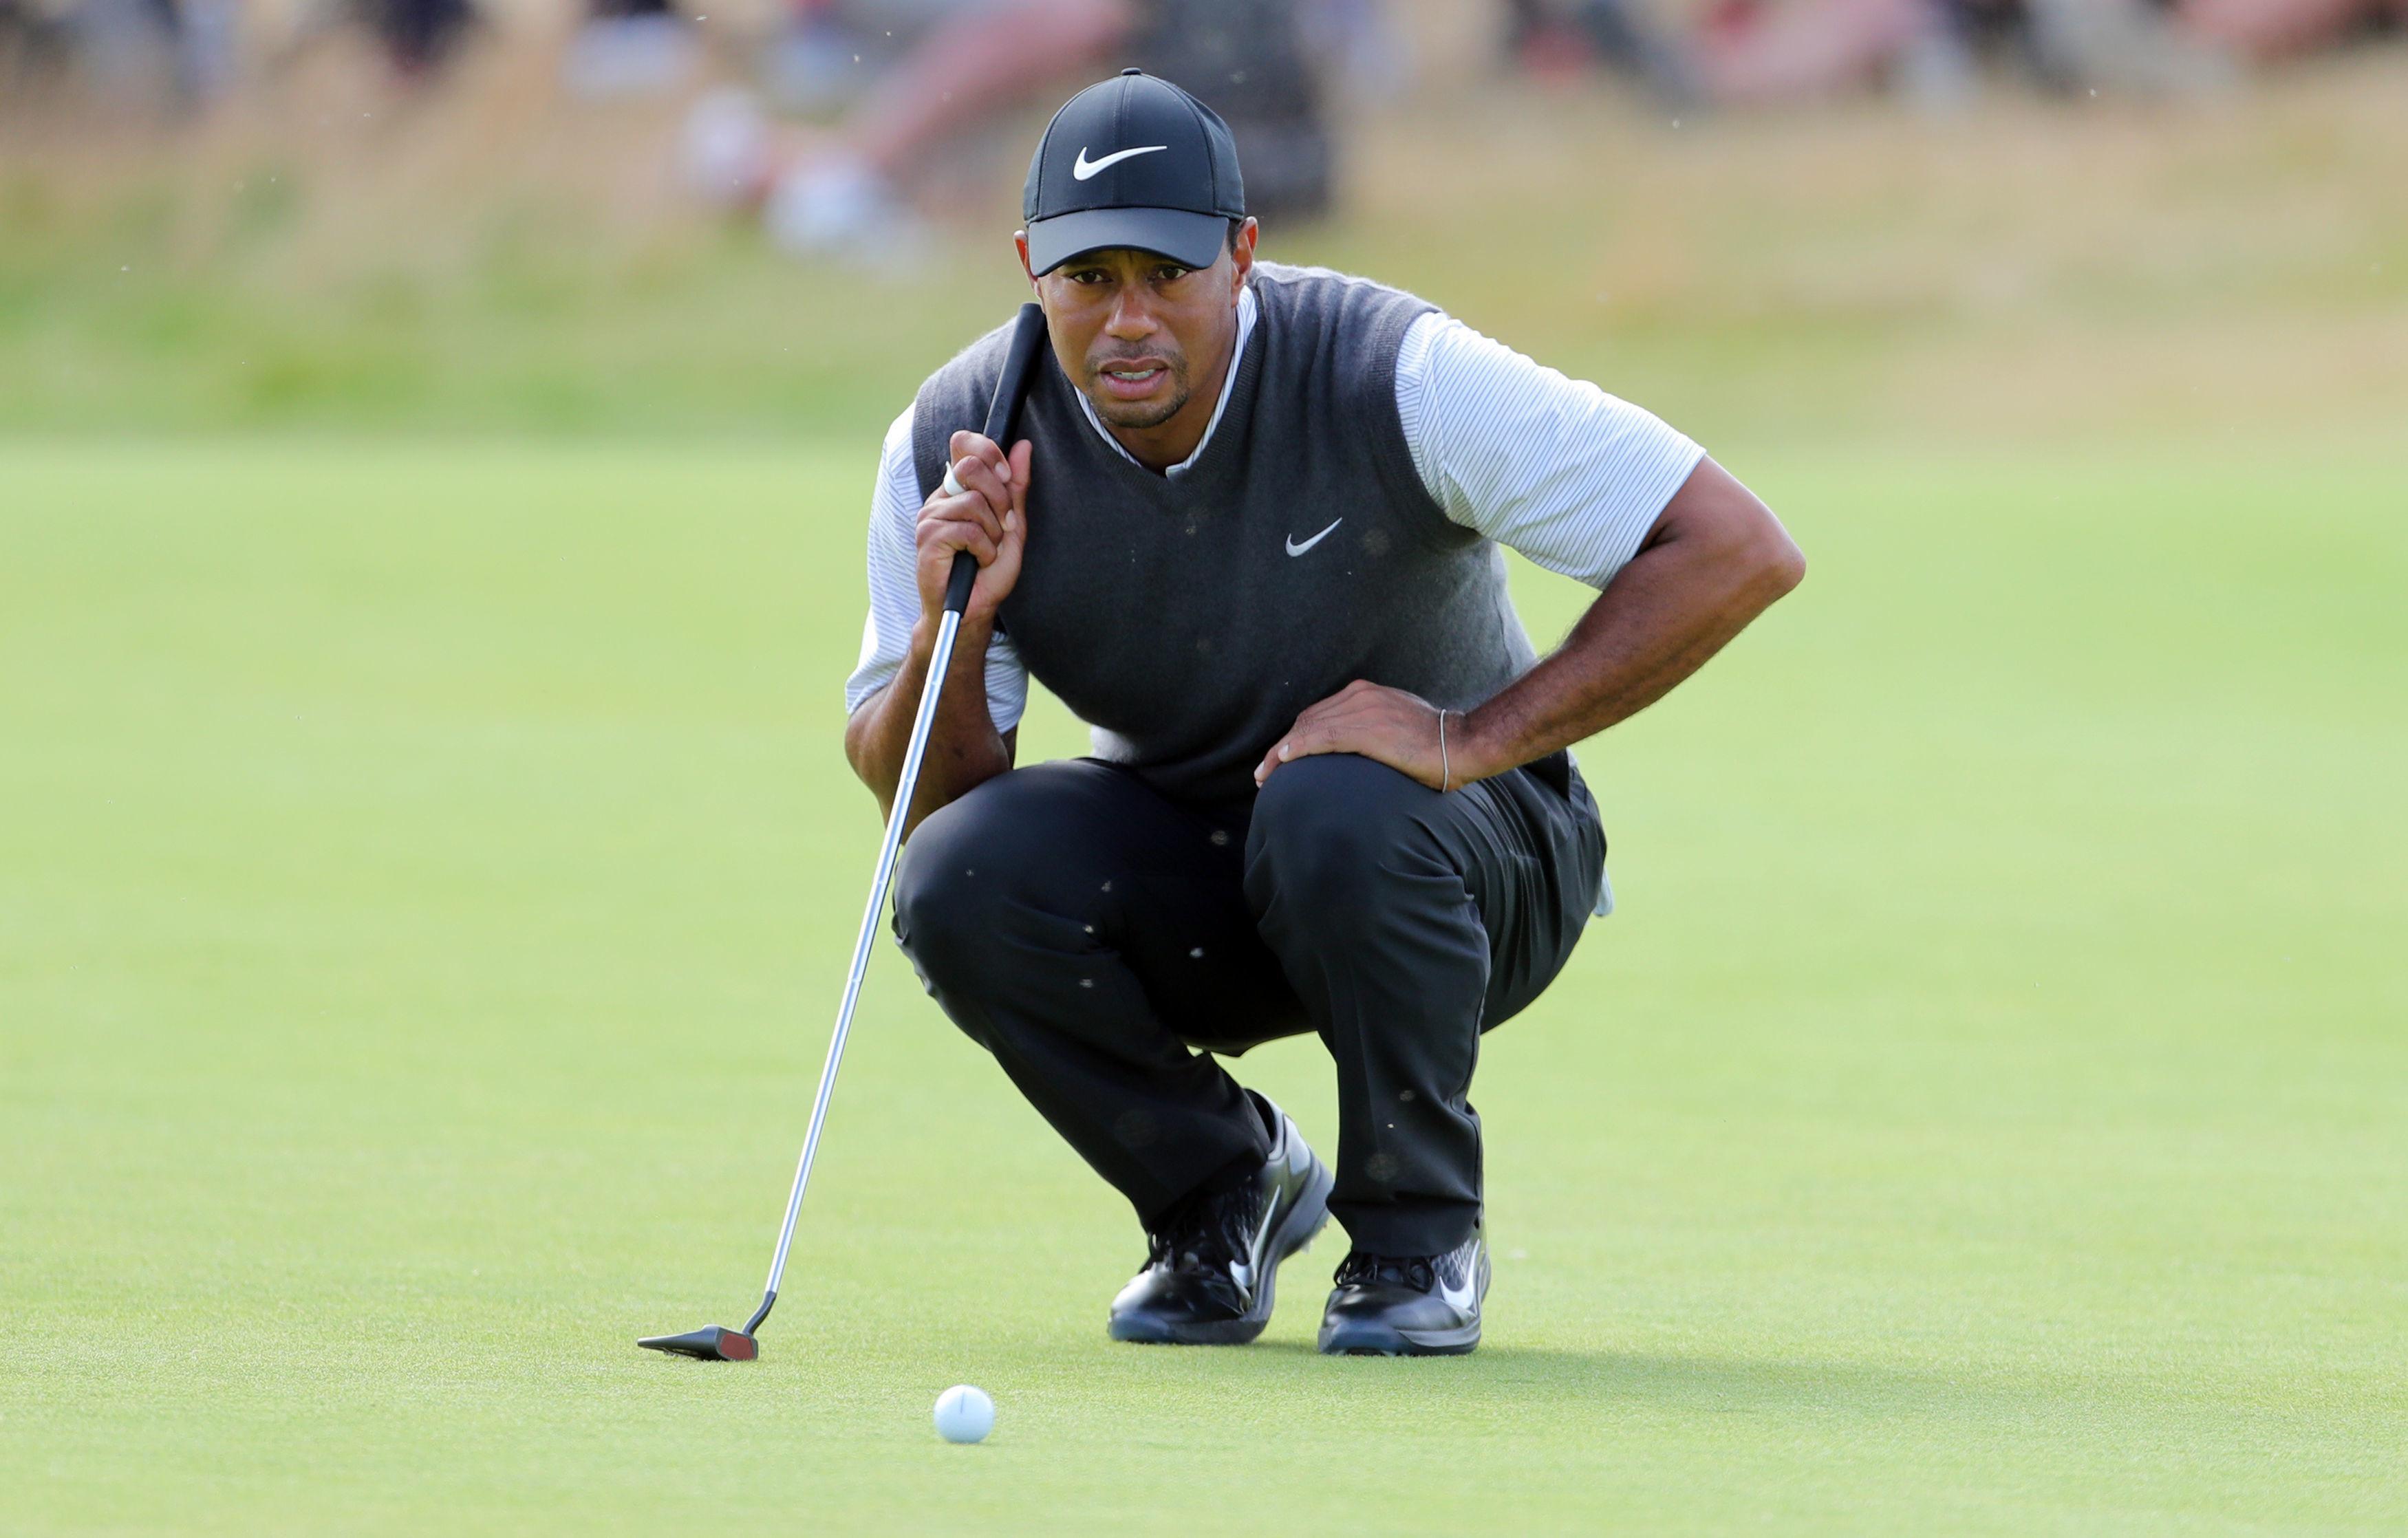 Tiger Woods studies a putt during his third round five-under 66